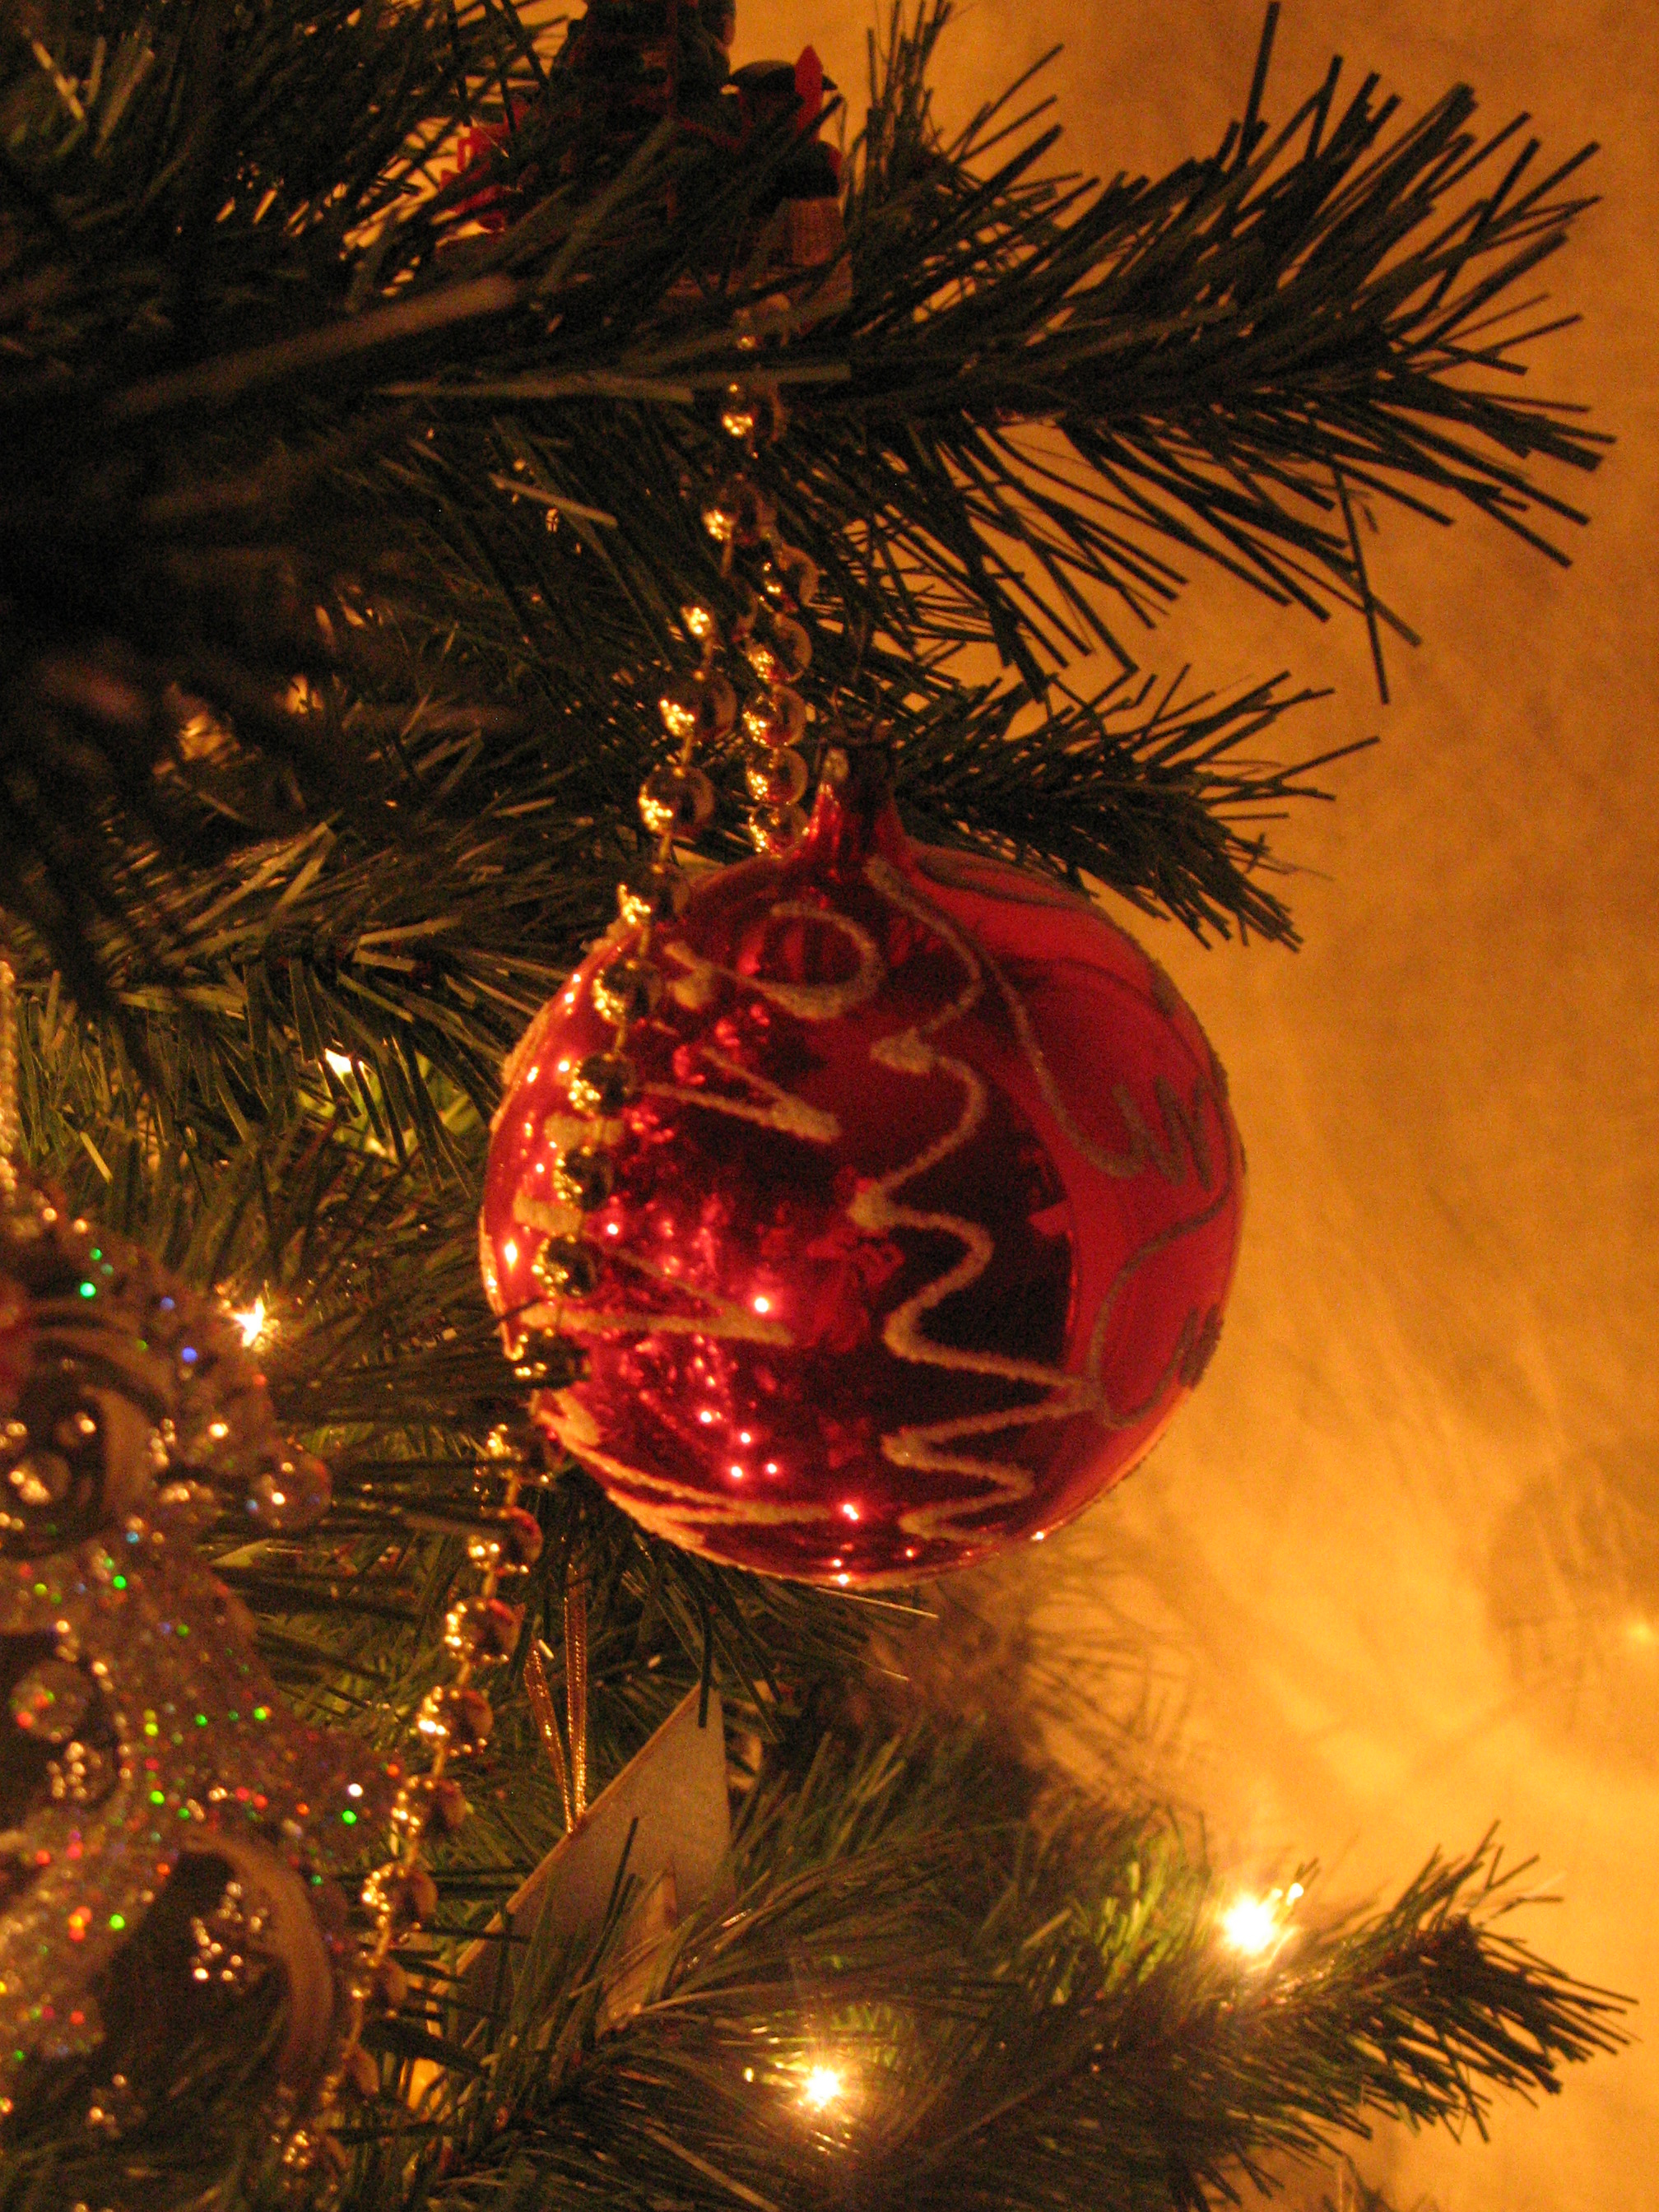 Christmas, Ball, Bspo07, Celebrate, Glow, HQ Photo